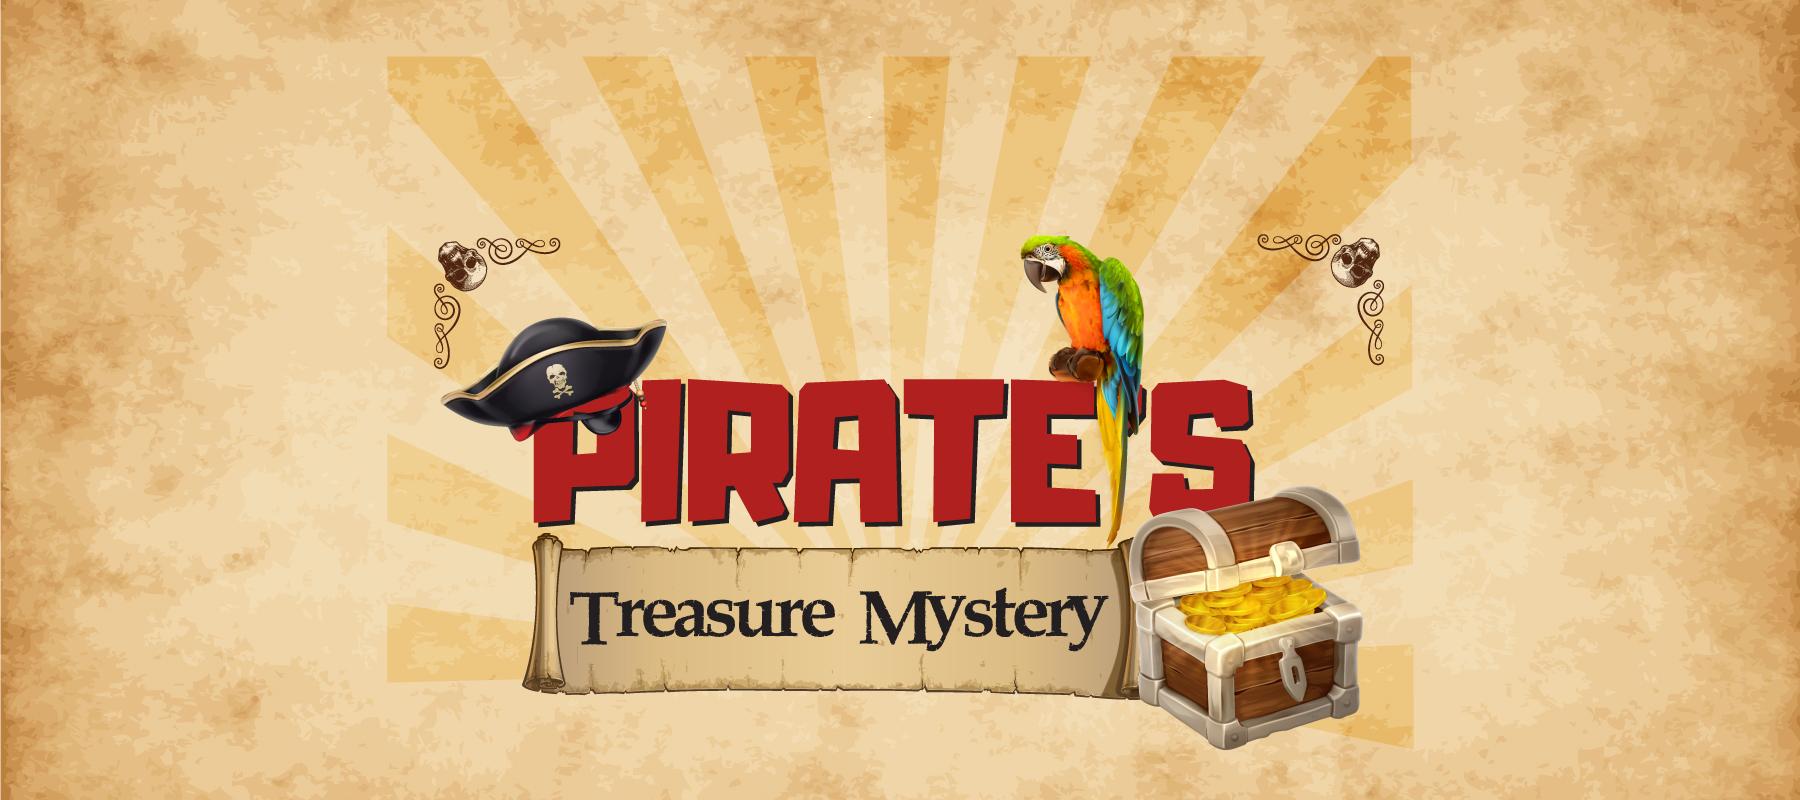 Pirate's Treasure Mystery